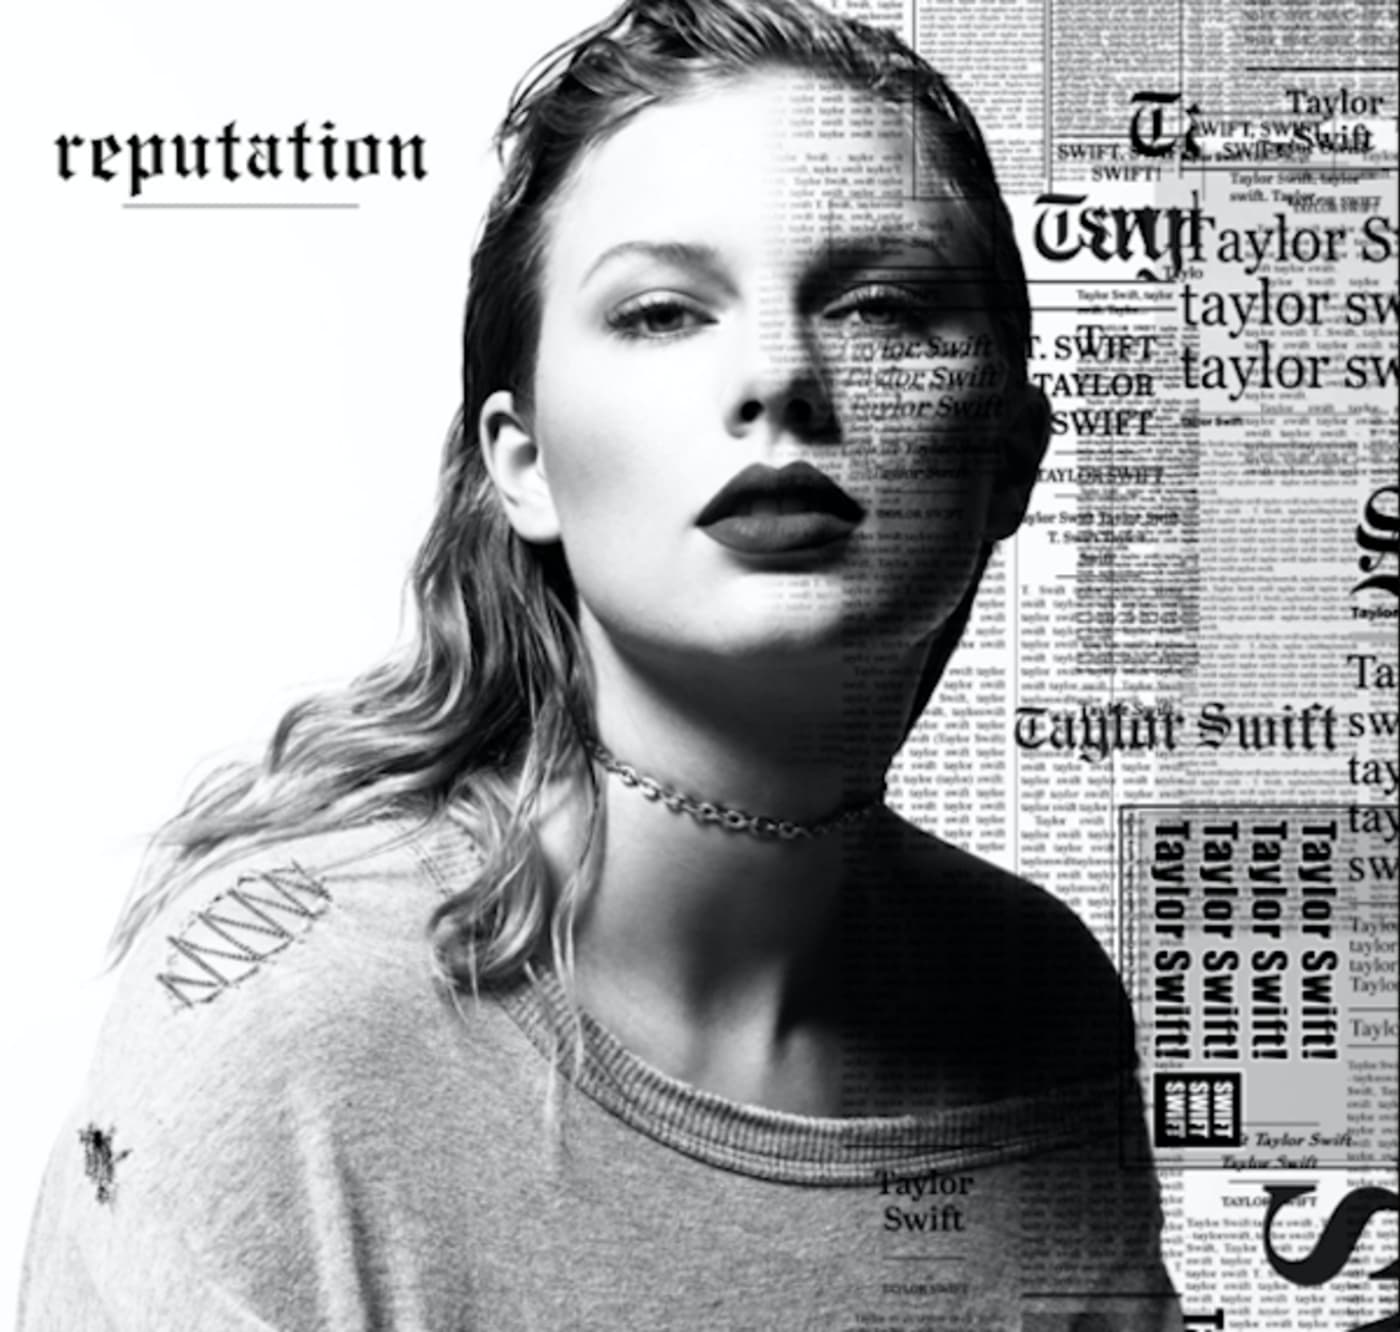 Taylor reputation